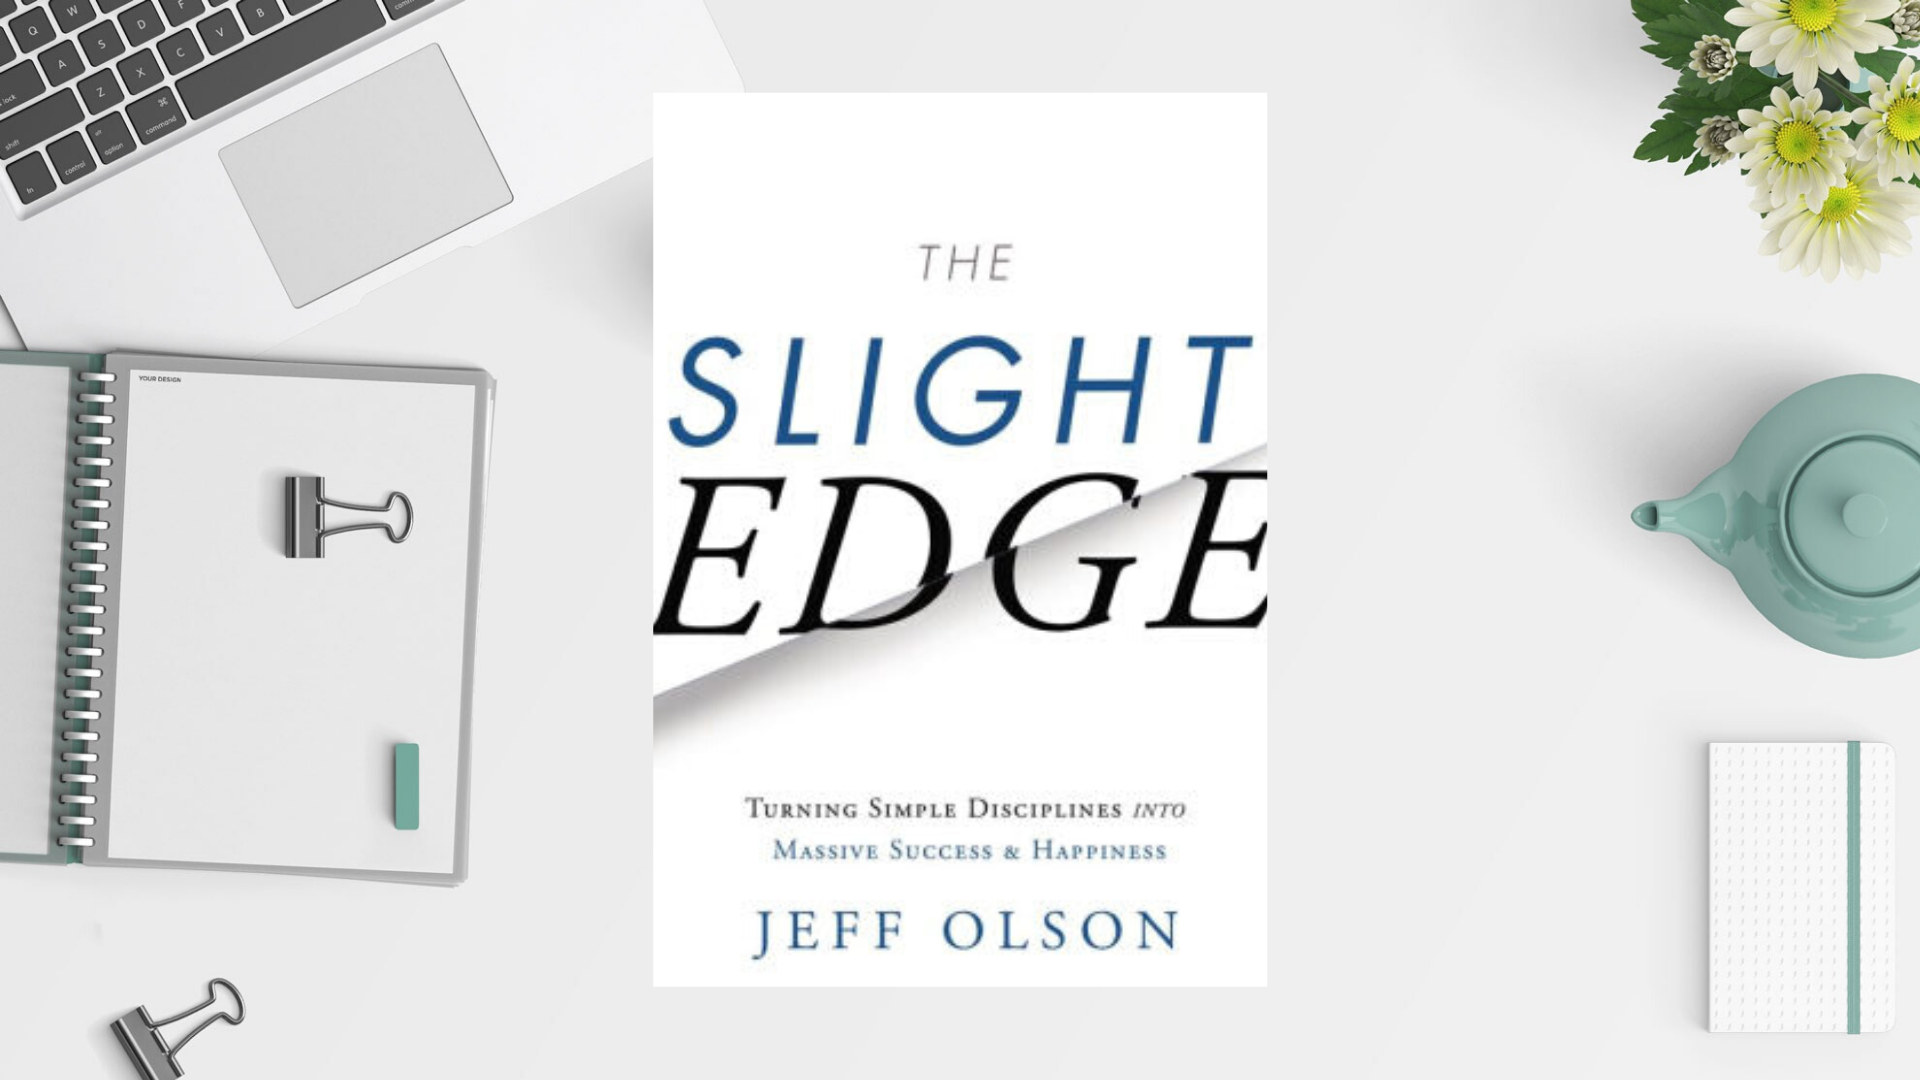 The Slight Edge book